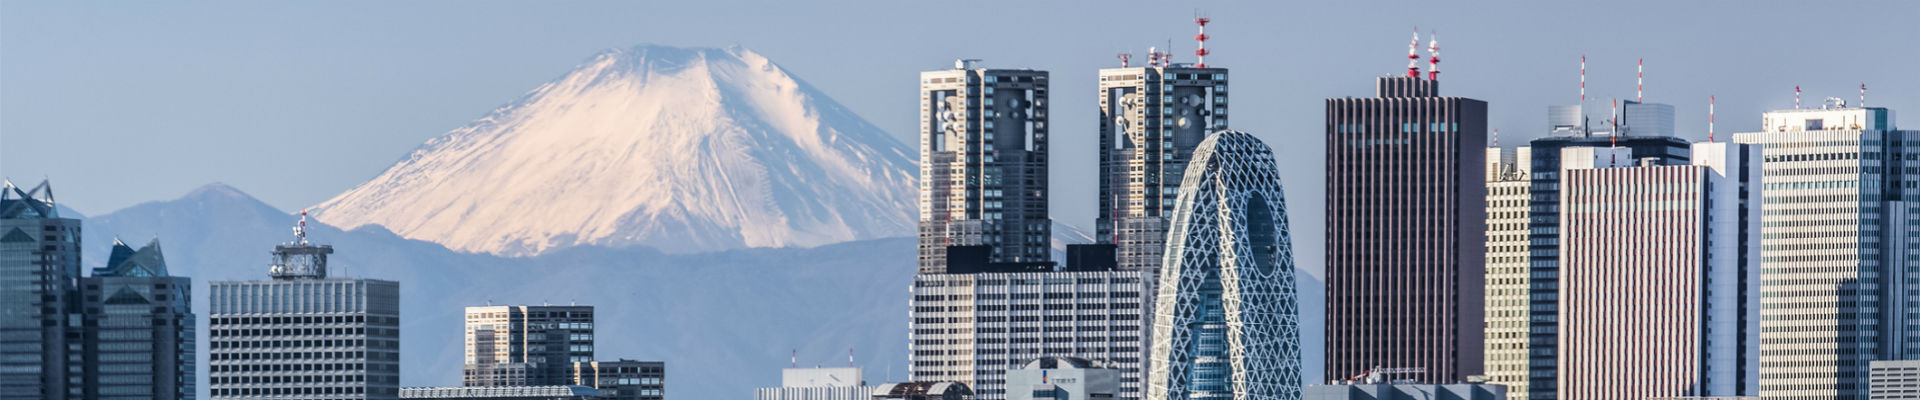 Japan Cultural Awareness Training, Doing Business in Japan